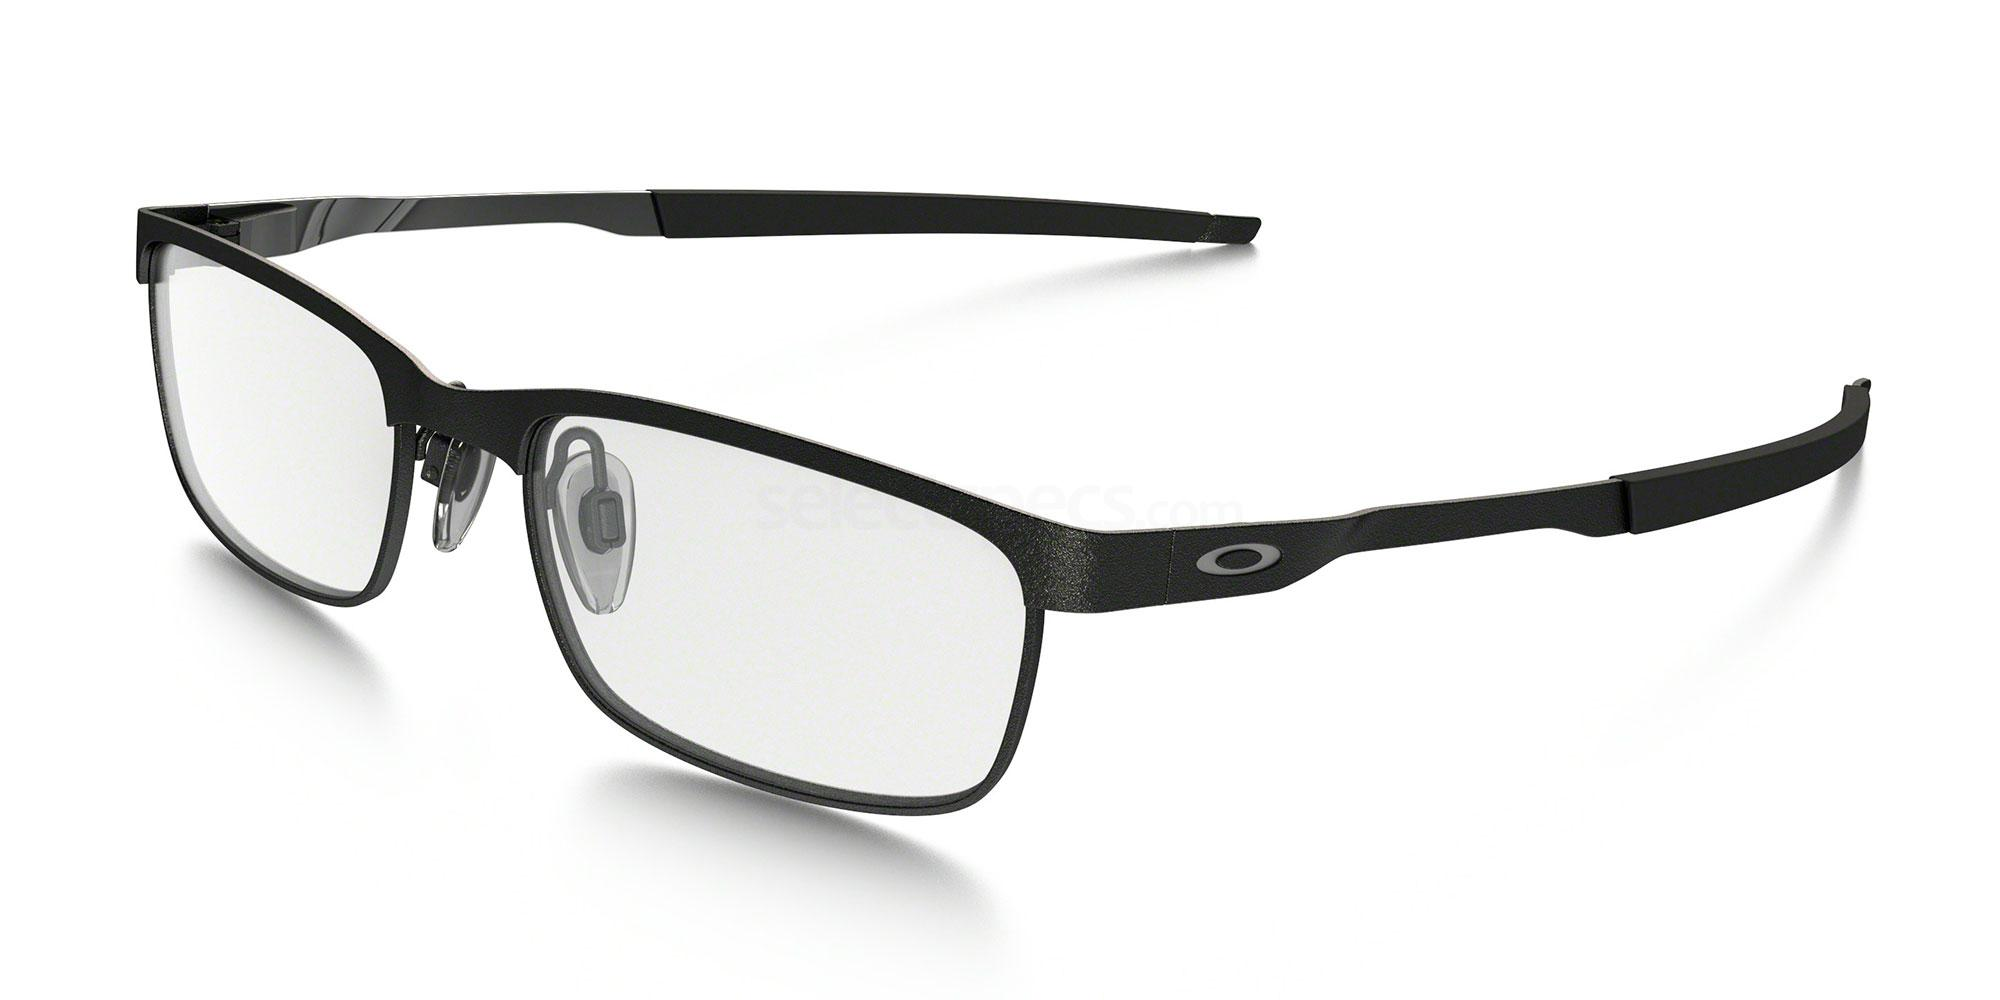 11f197d92 Oakley OX3222 STEEL PLATE glasses | Free prescription lenses ...